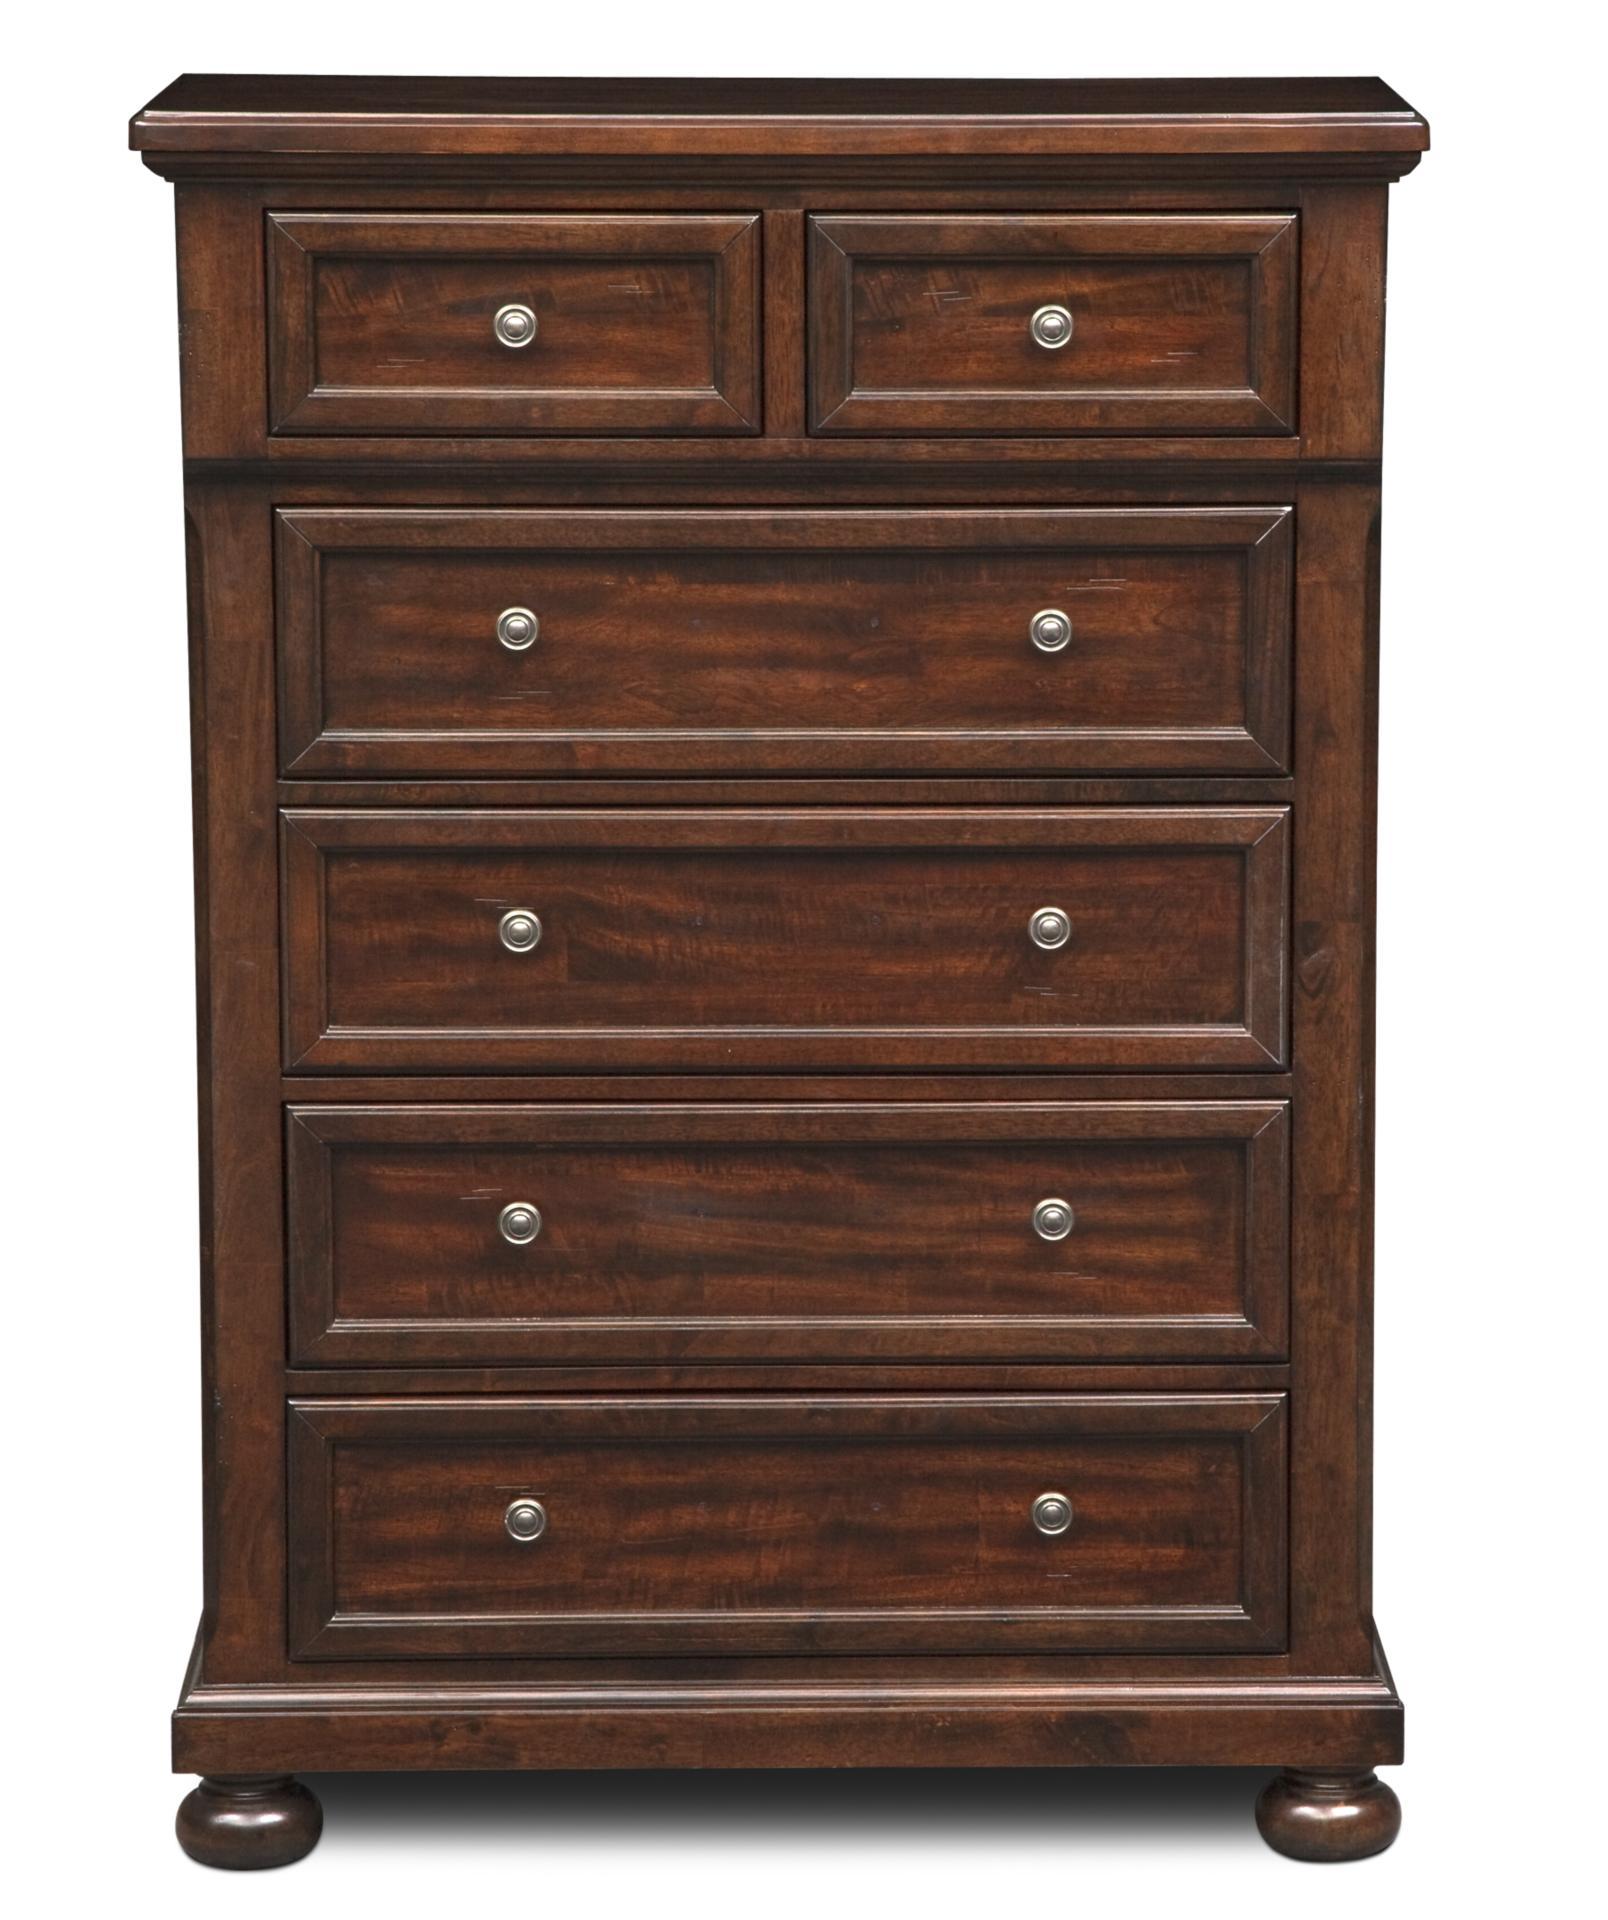 value city furniture charlotte nc 28273 rh valuecityfurniture com Rustic Dining Room Sets Thomasville Dining Room Sets